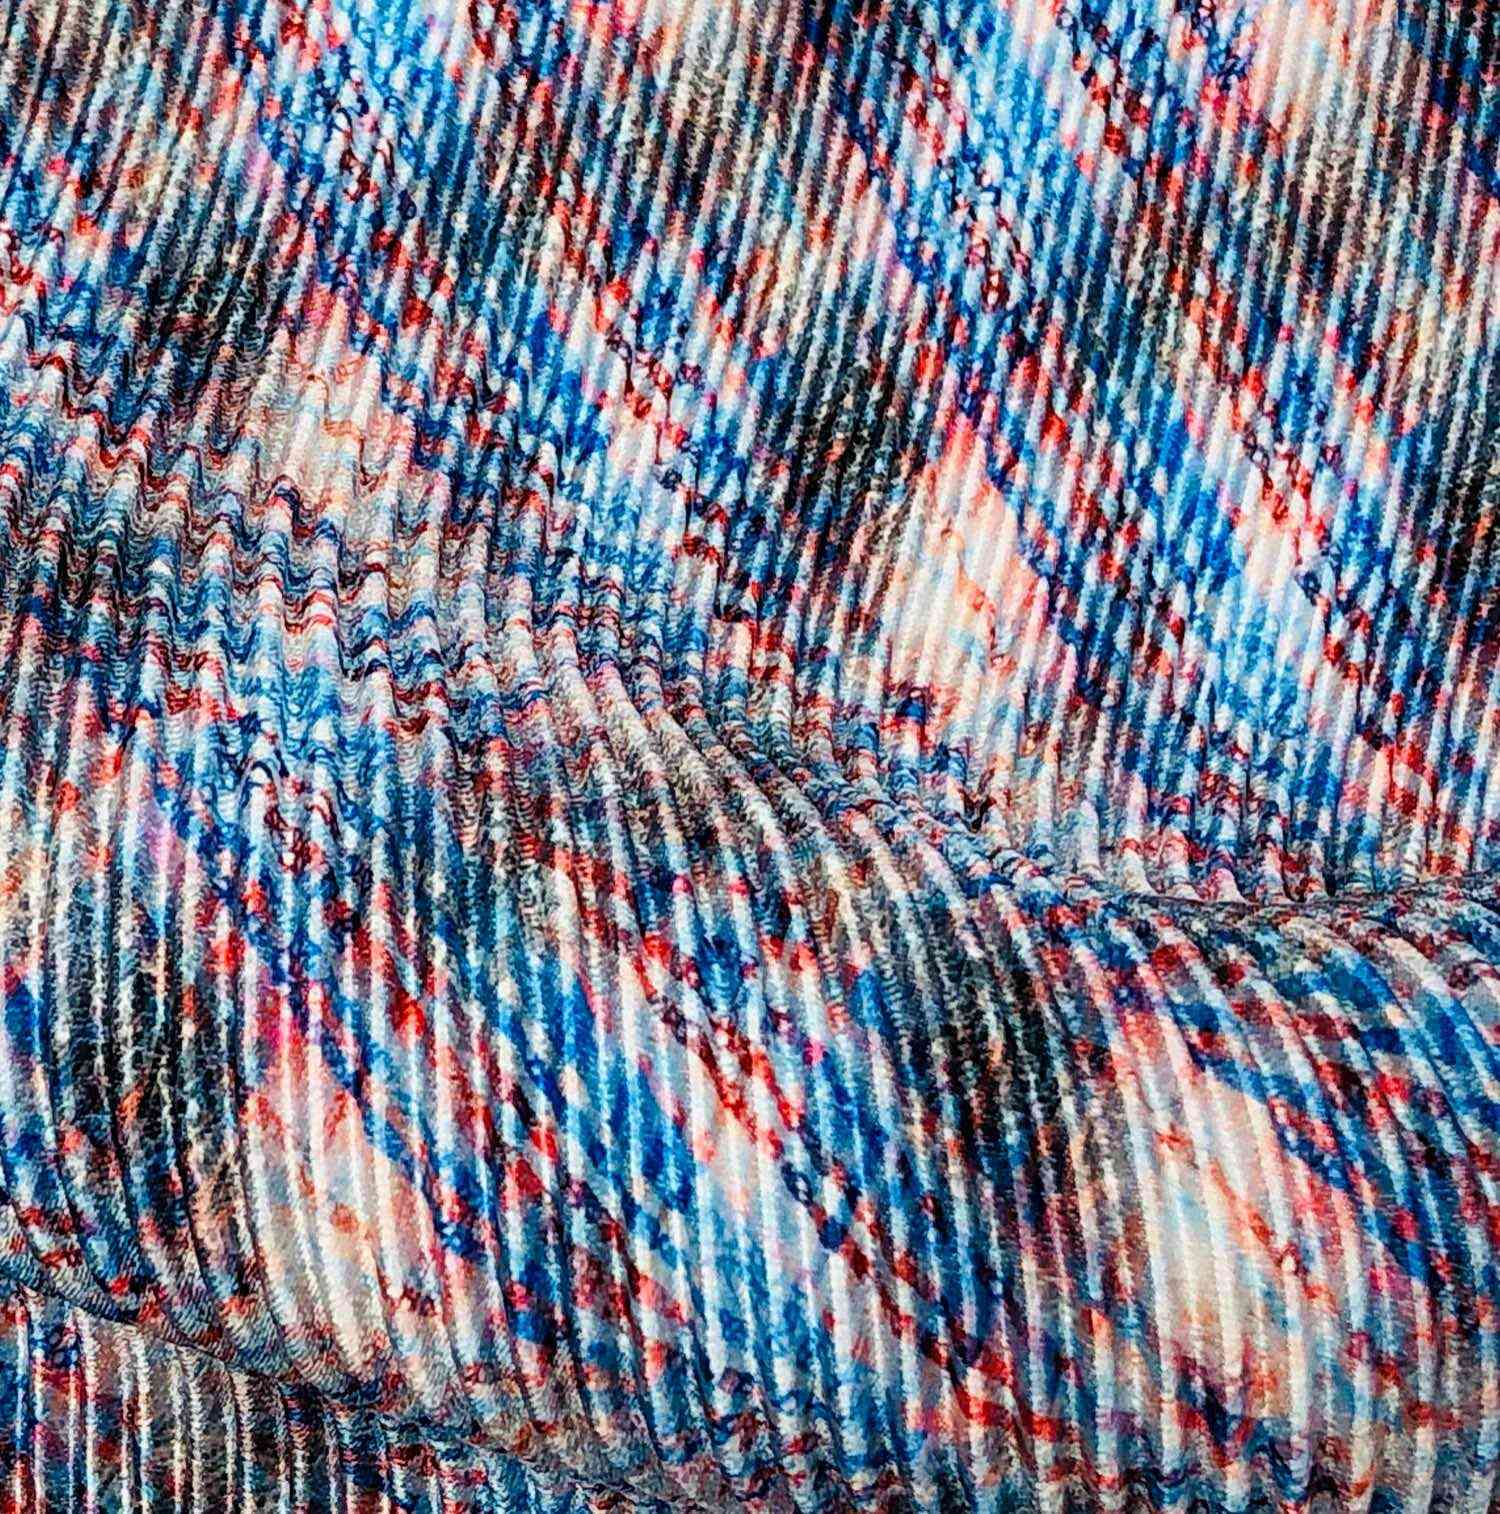 Printed Fabrics - plix - PLIX Polyester